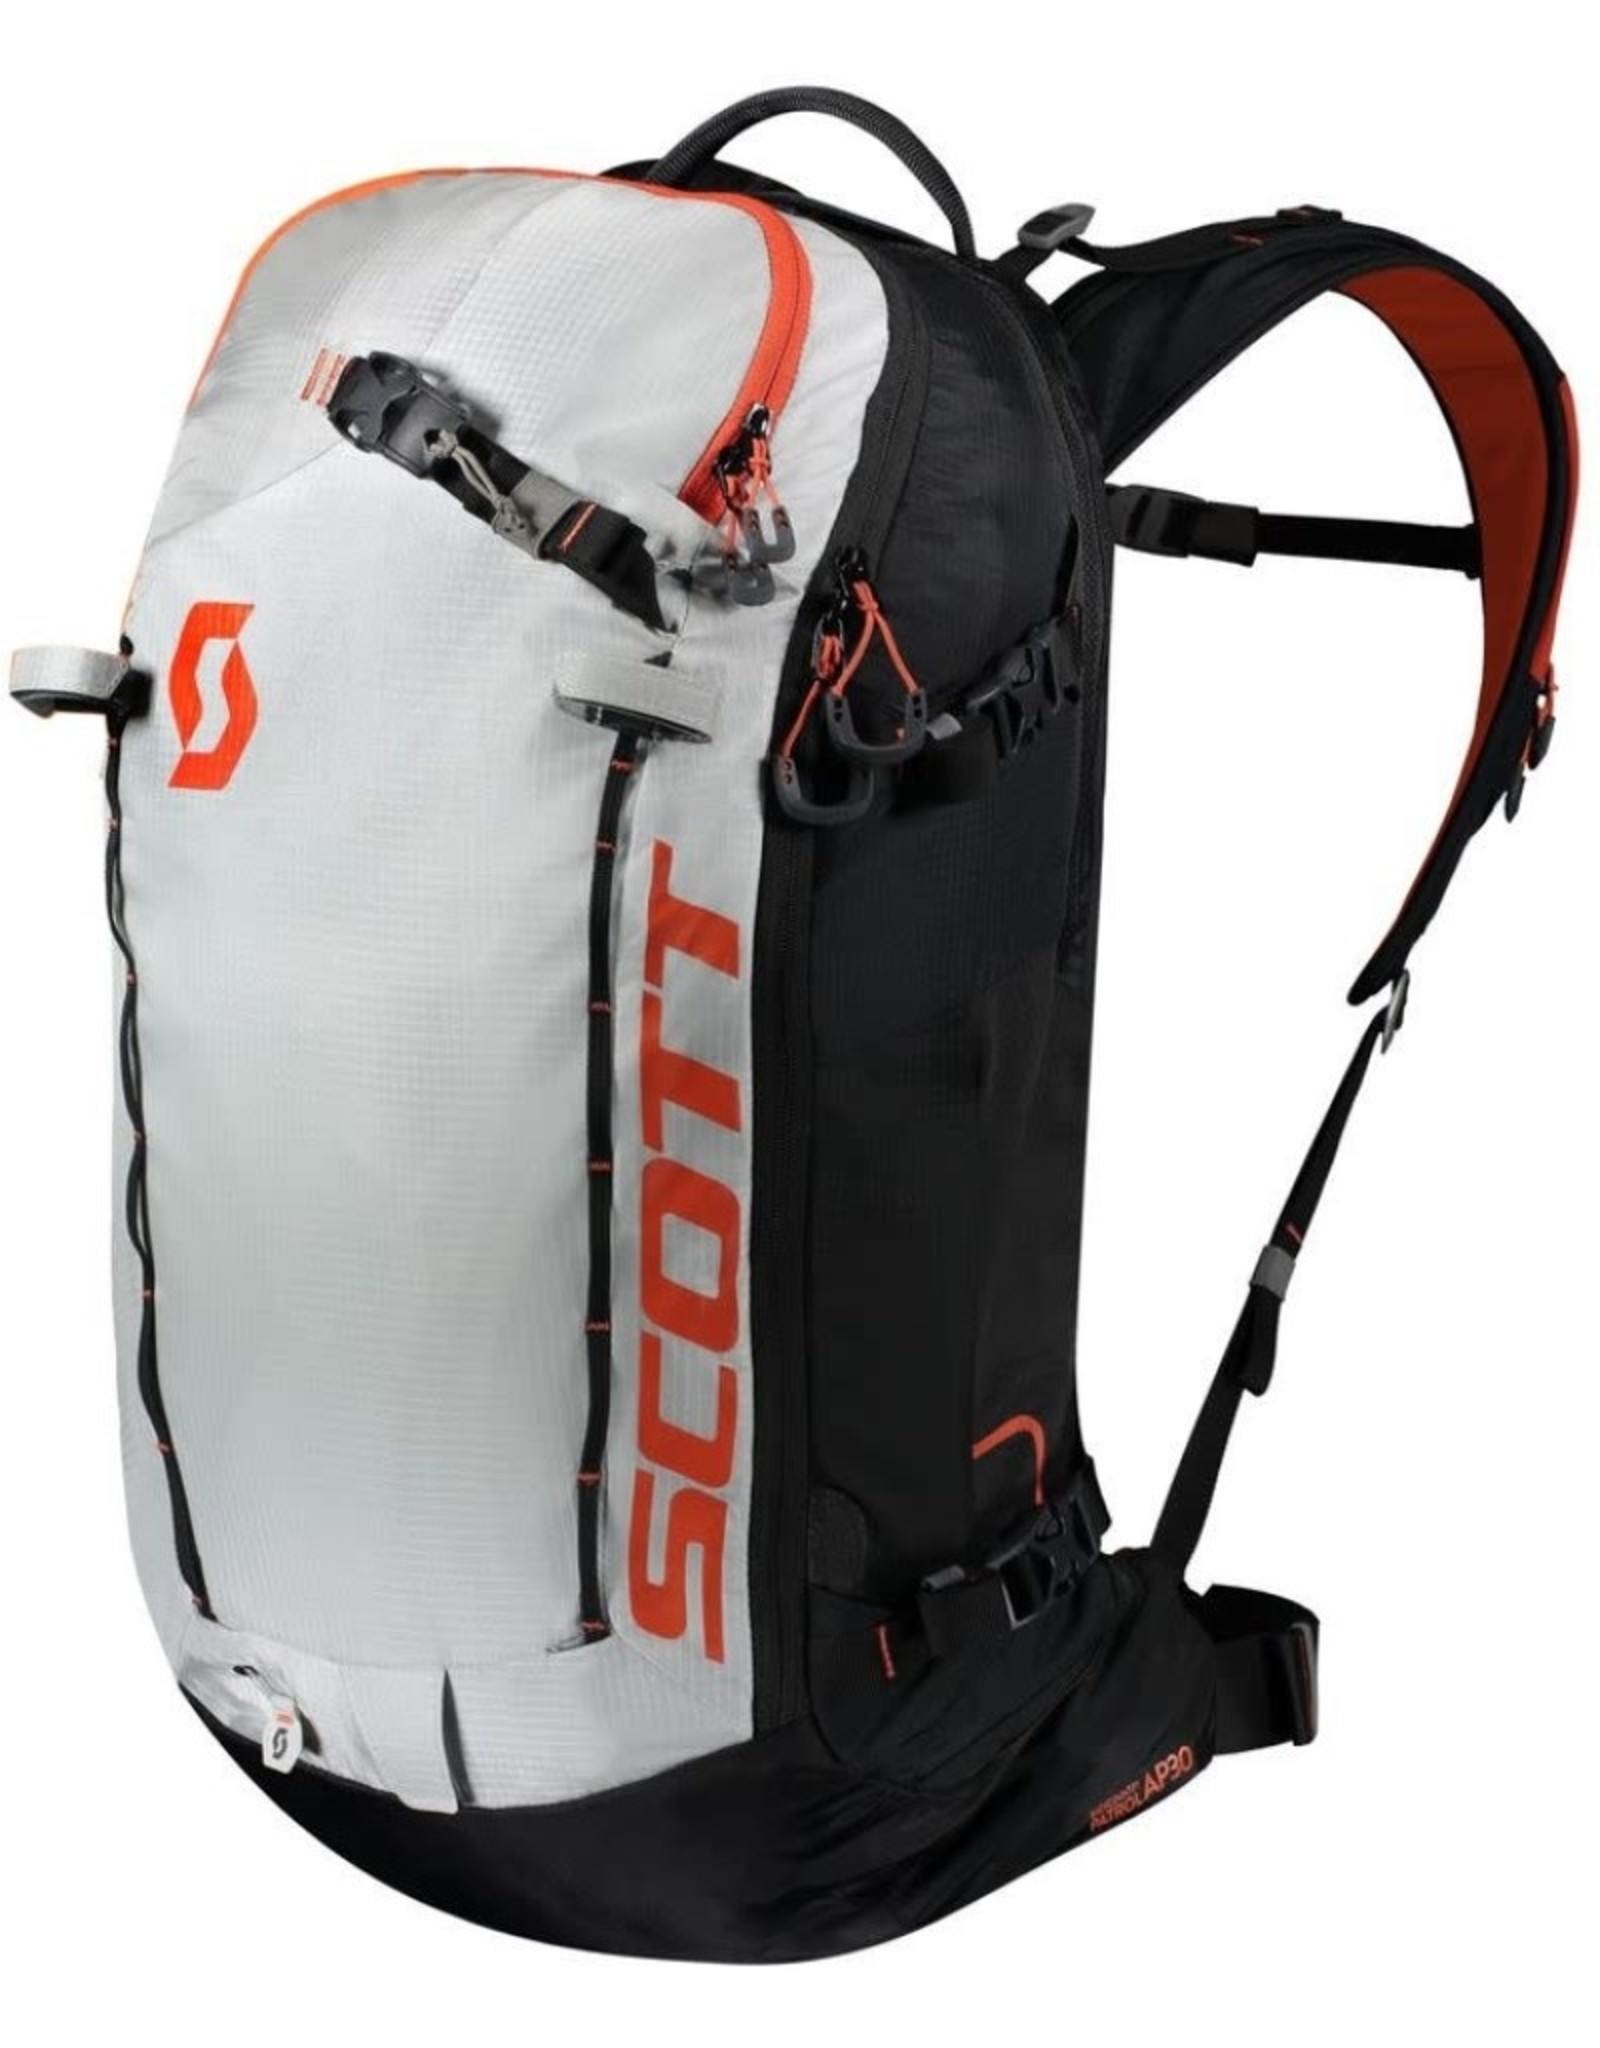 Scott Sports Patrol E1 30L airbag pack - Blk/Tangerine NL